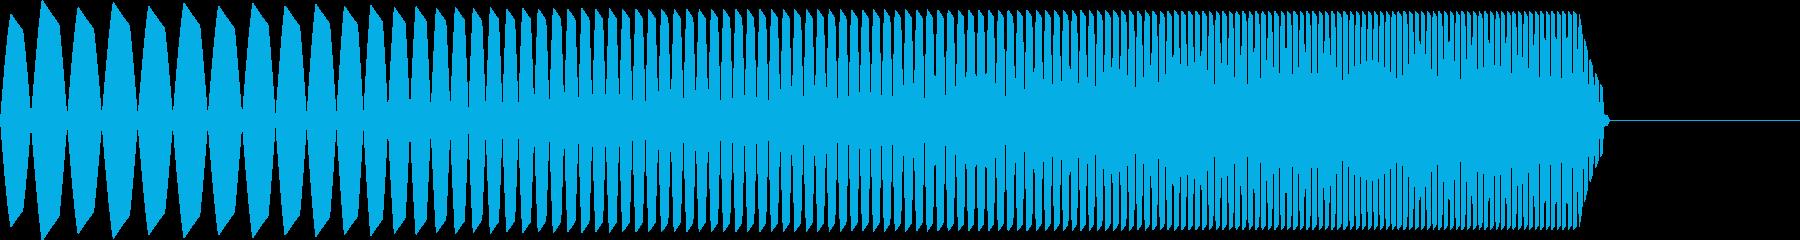 AMGアナログFX41の再生済みの波形